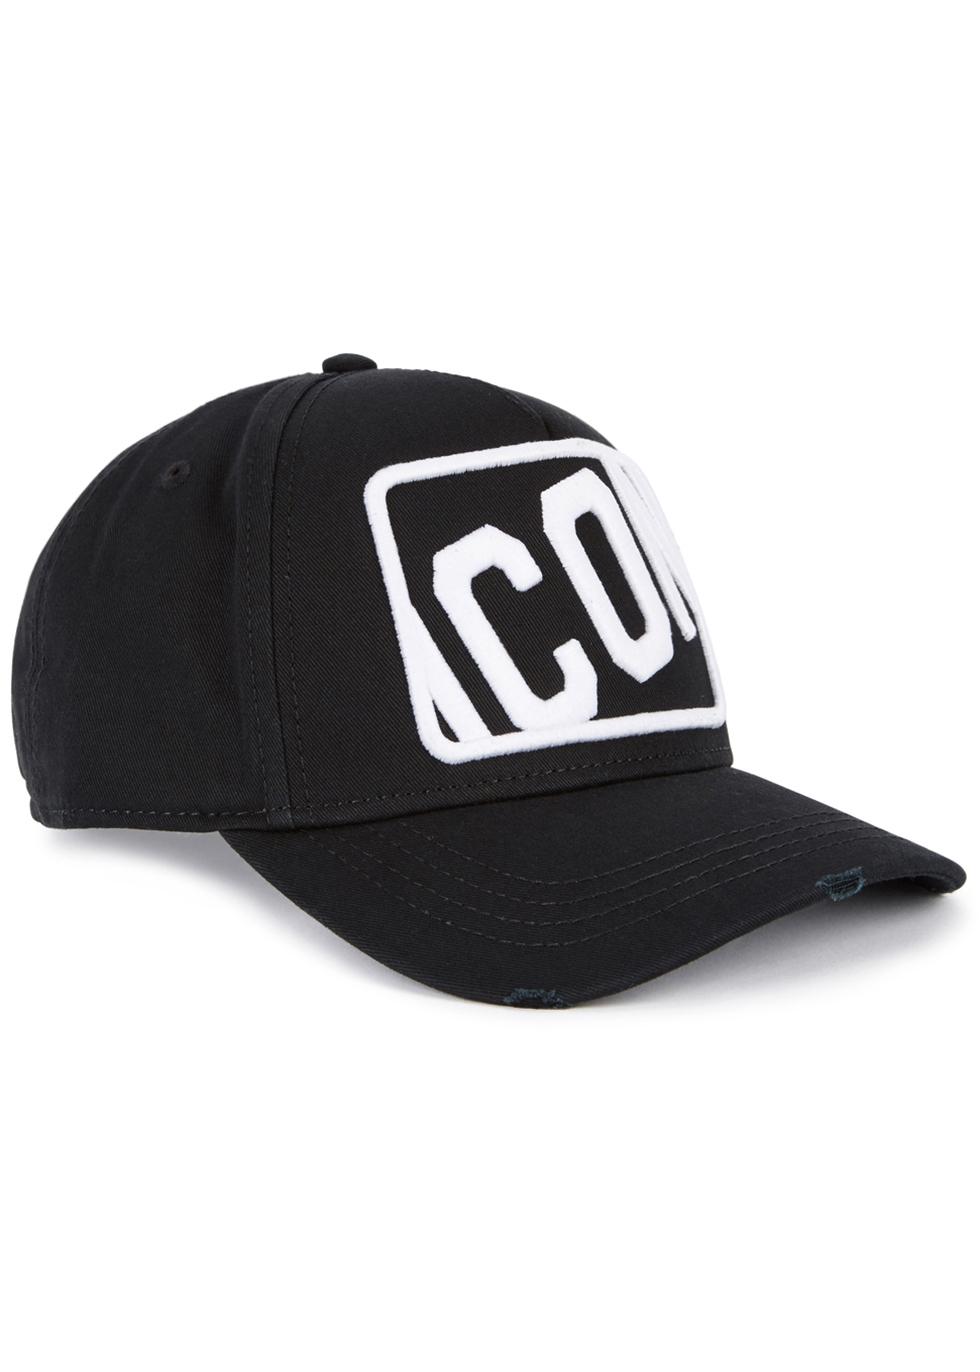 DSQUARED2 ICON EMBROIDERED TWILL CAP